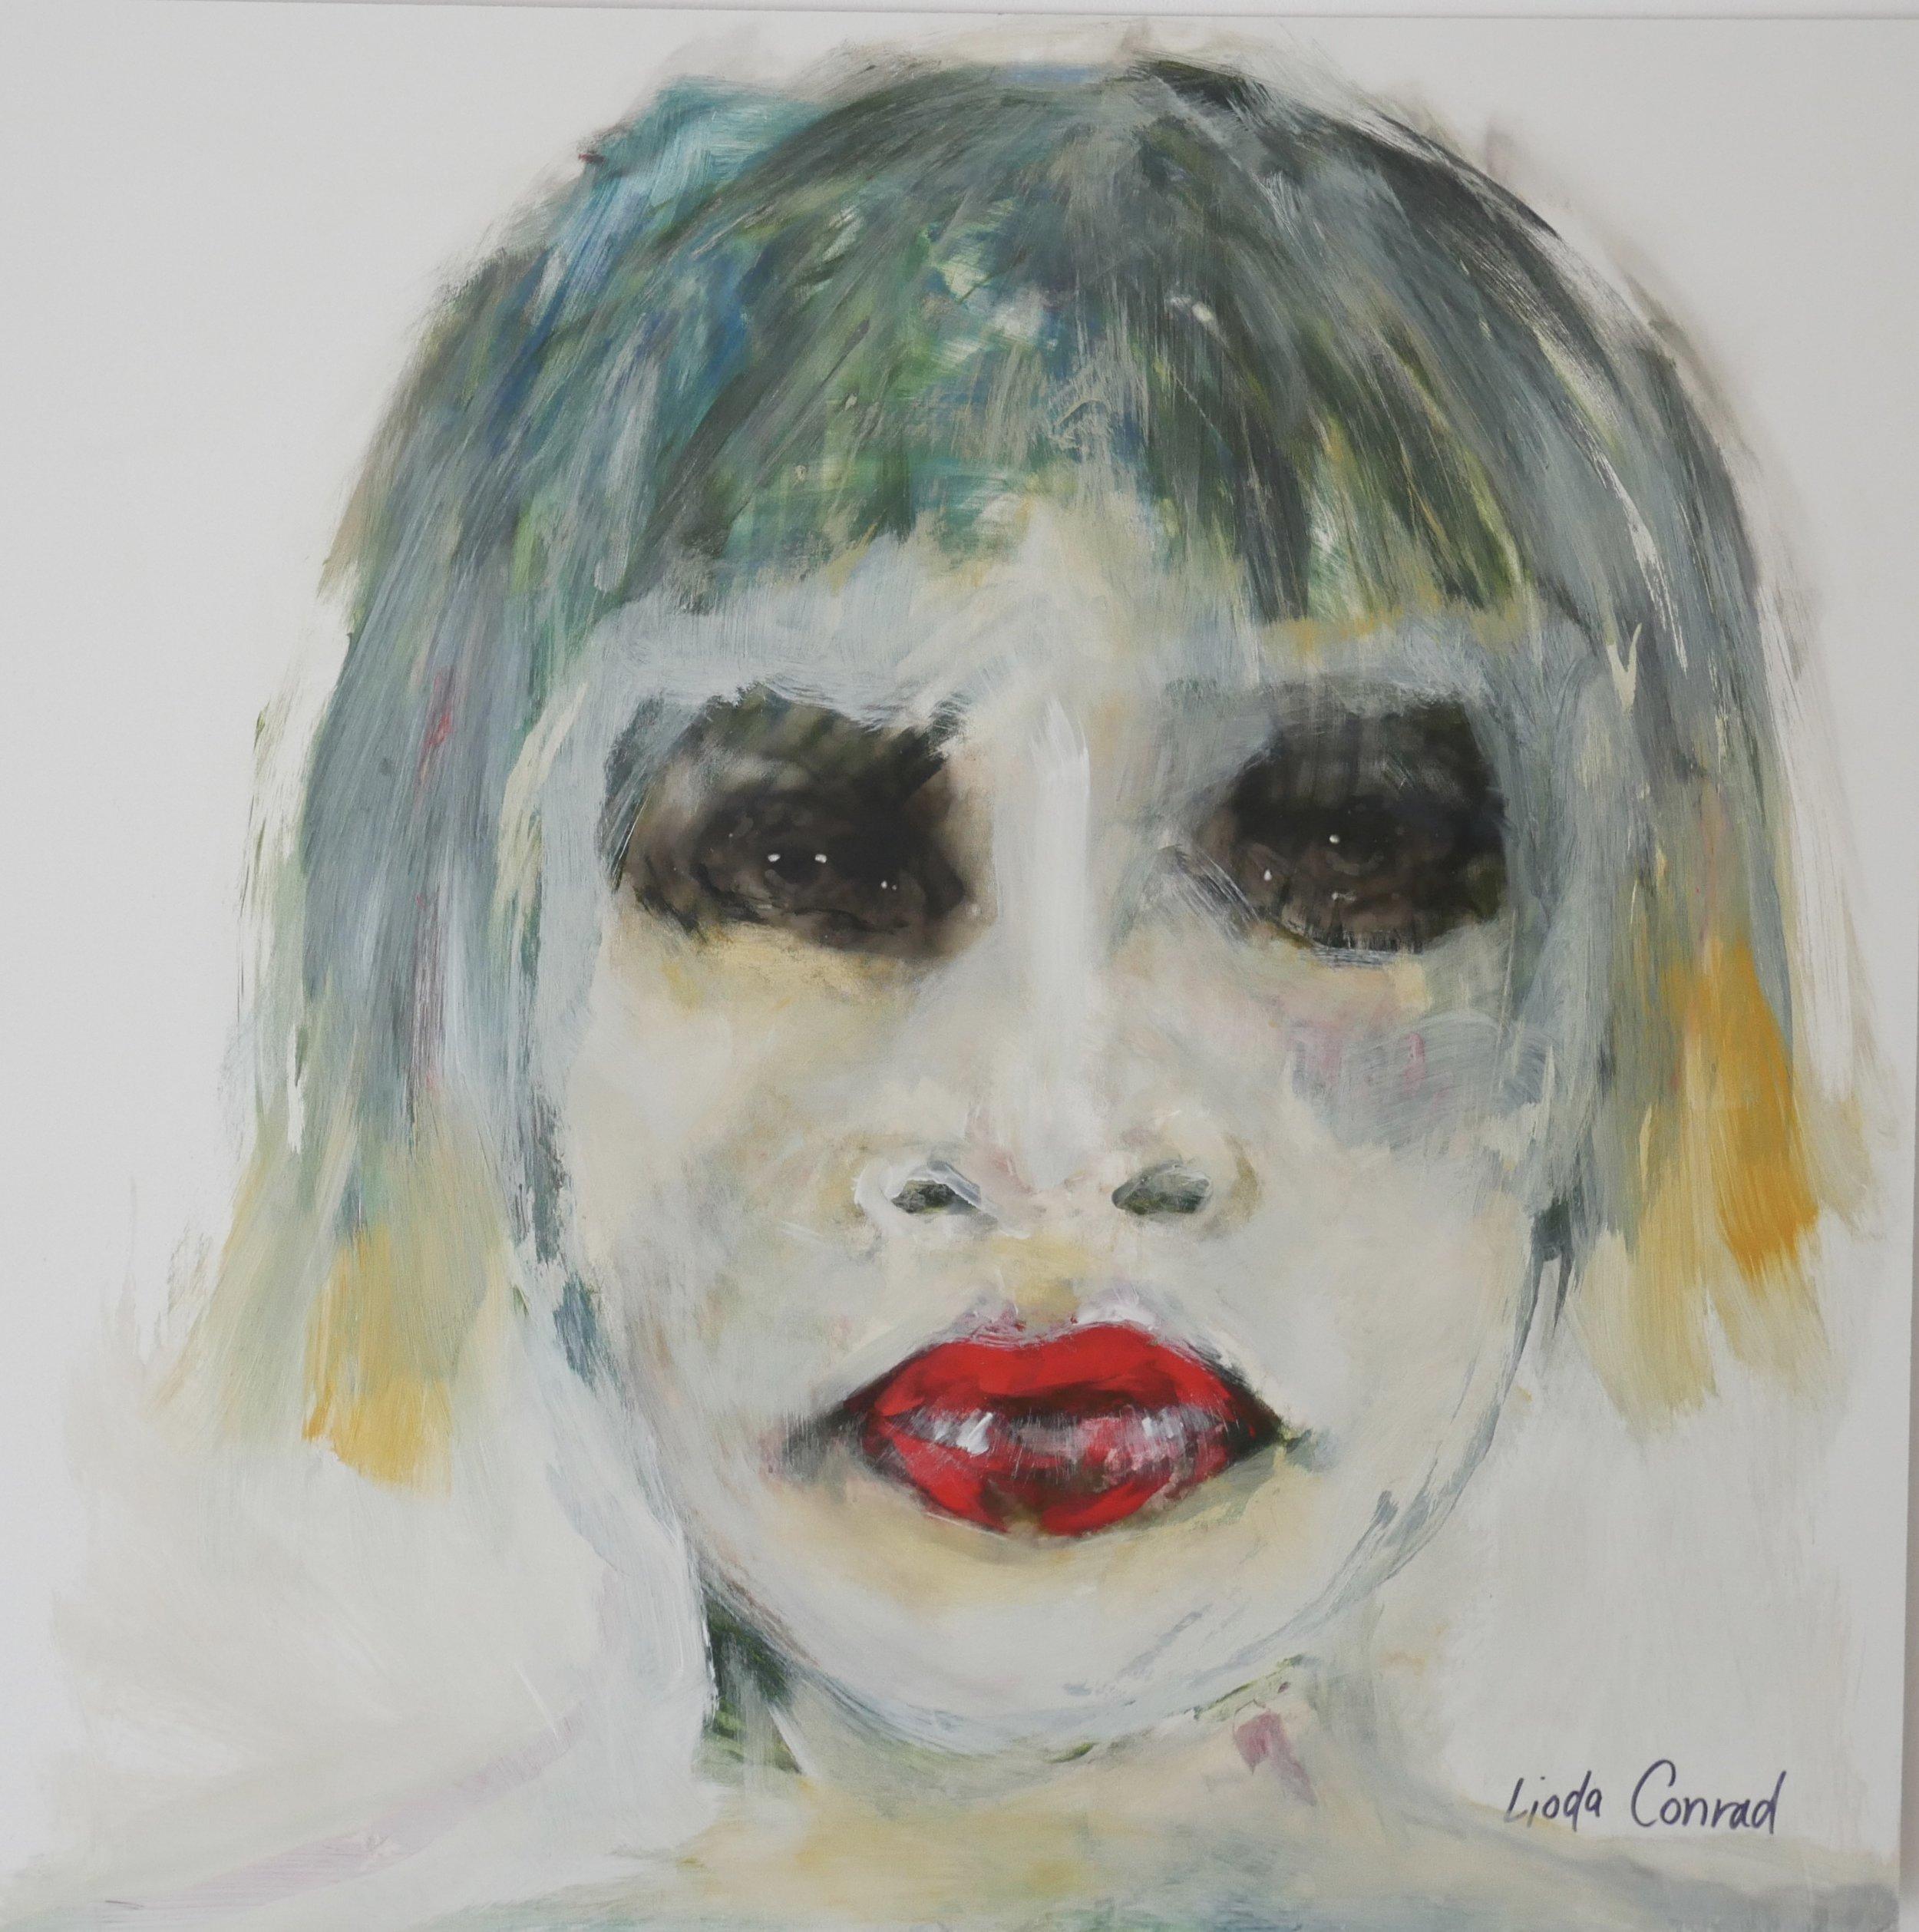 Green Hair by Lioda Conrad